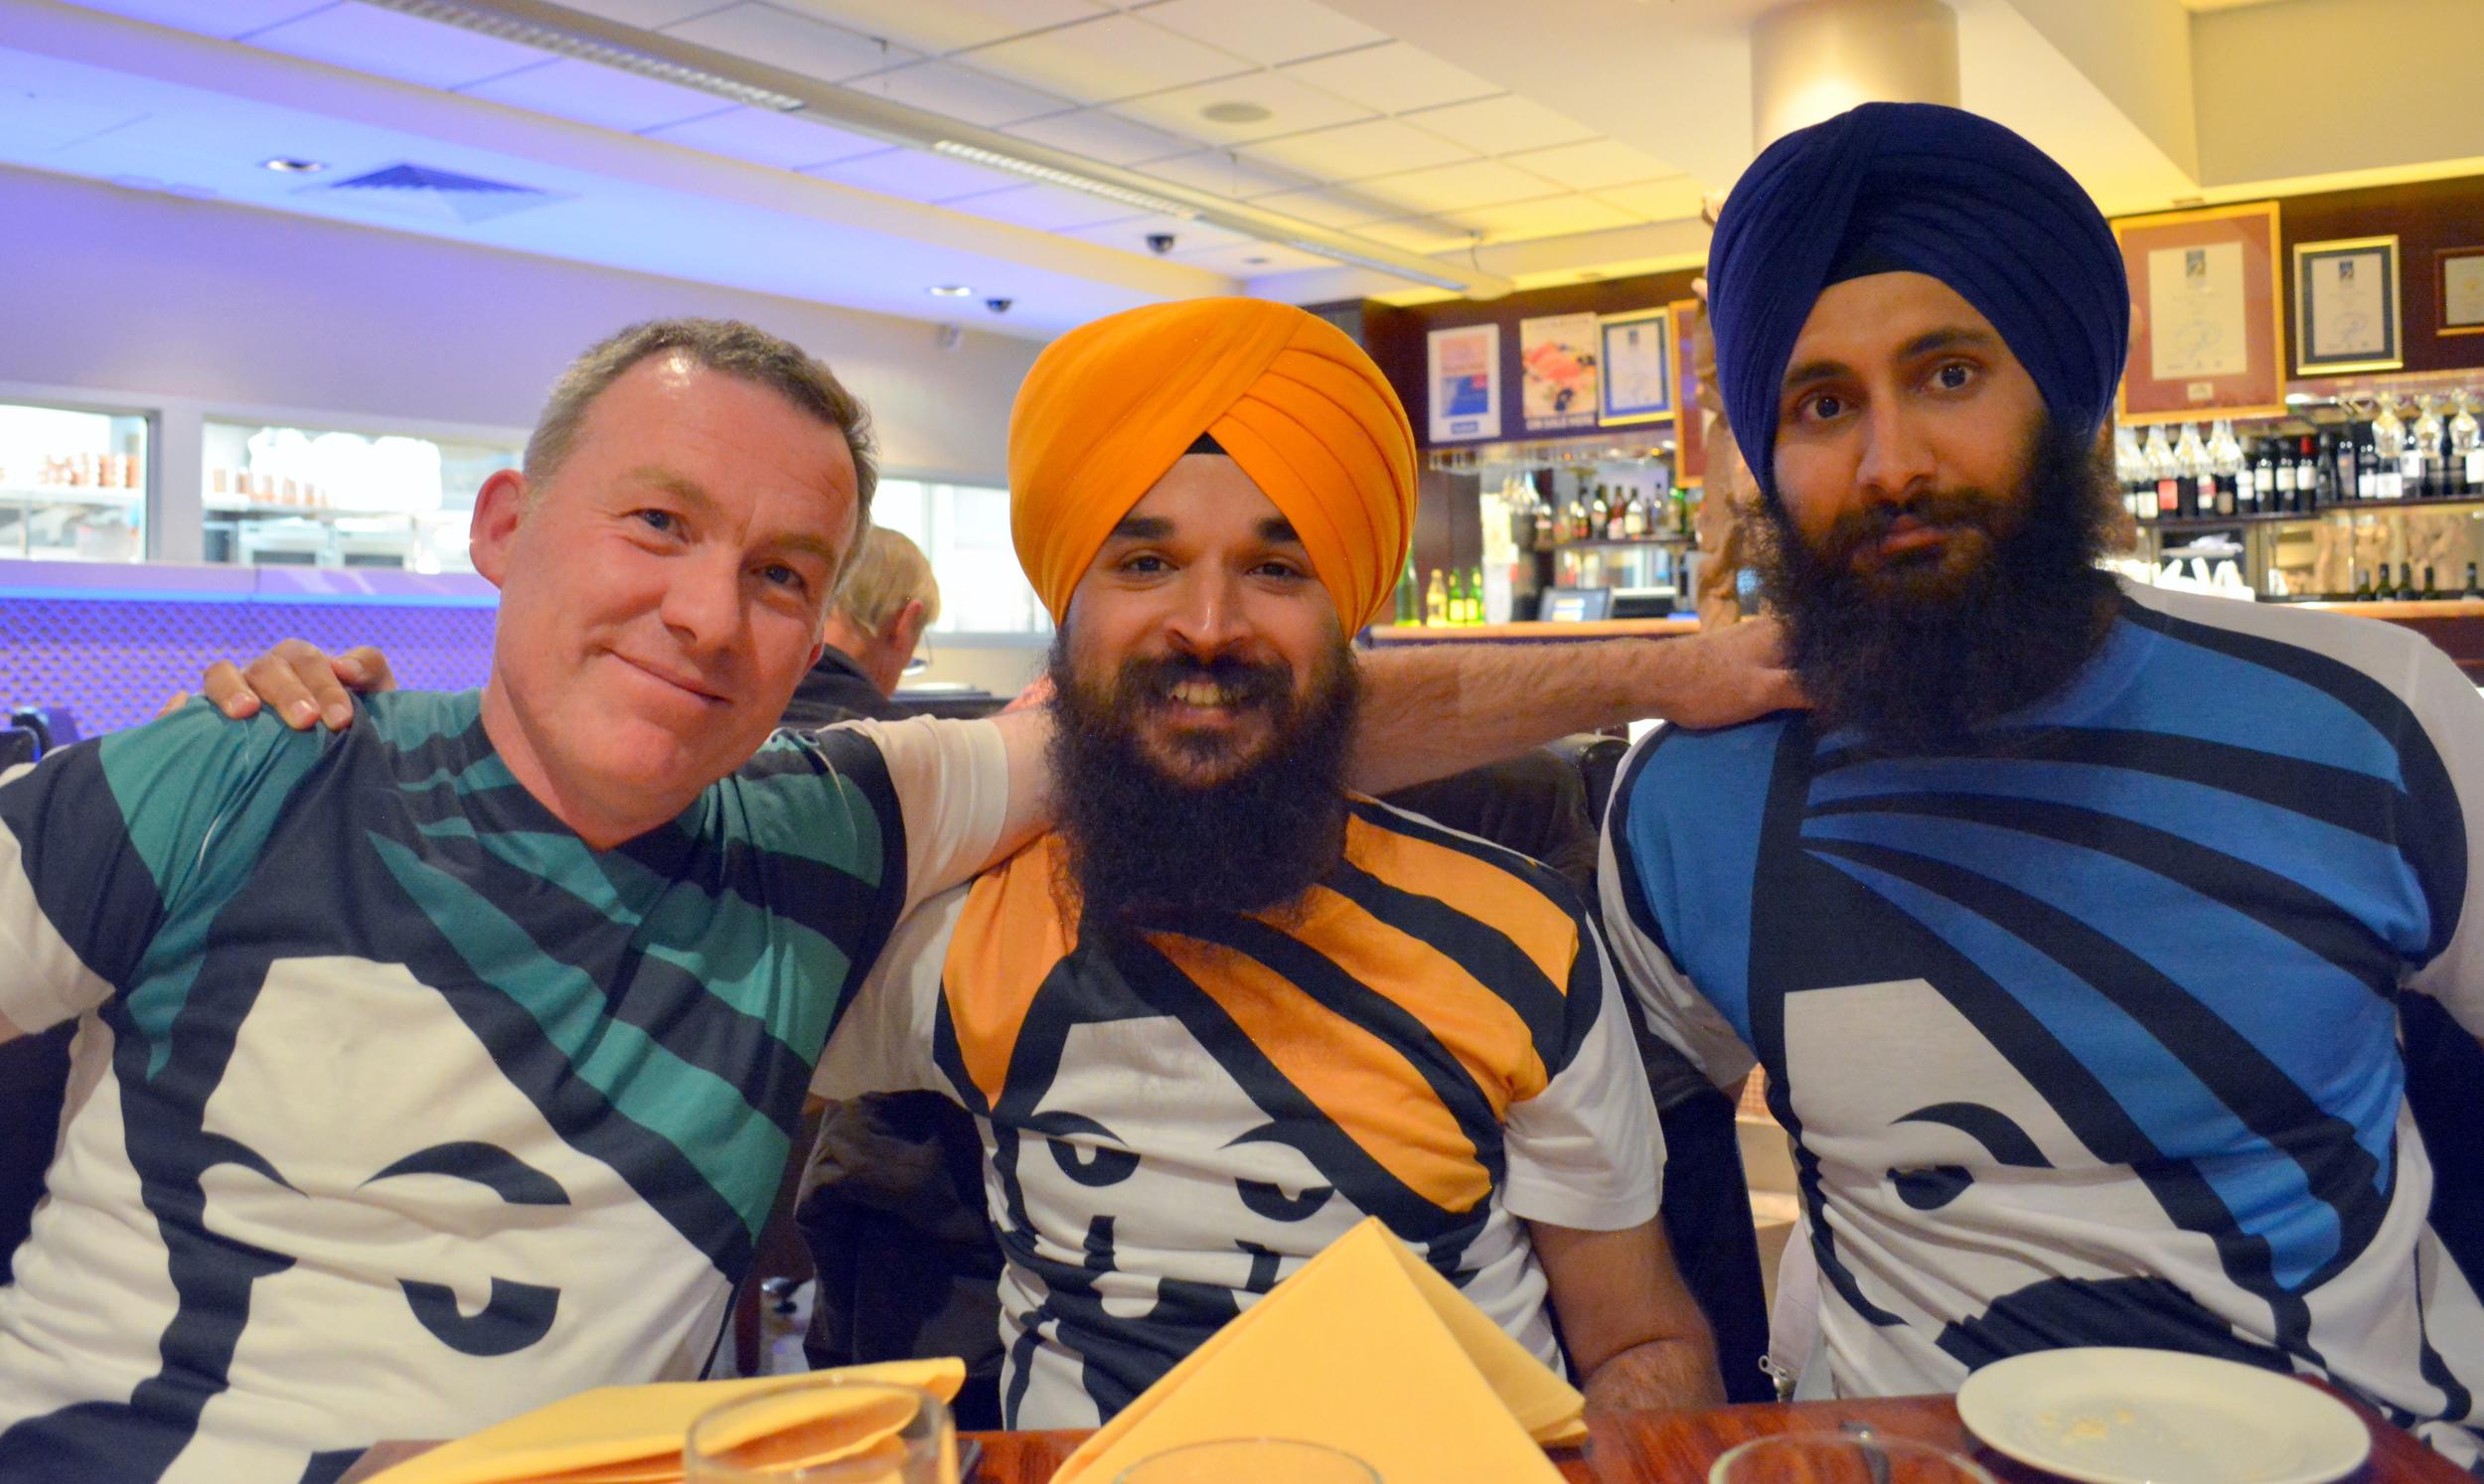 Left to Right: Daniel Connell, Harjit Singh, J  asdeep Singh